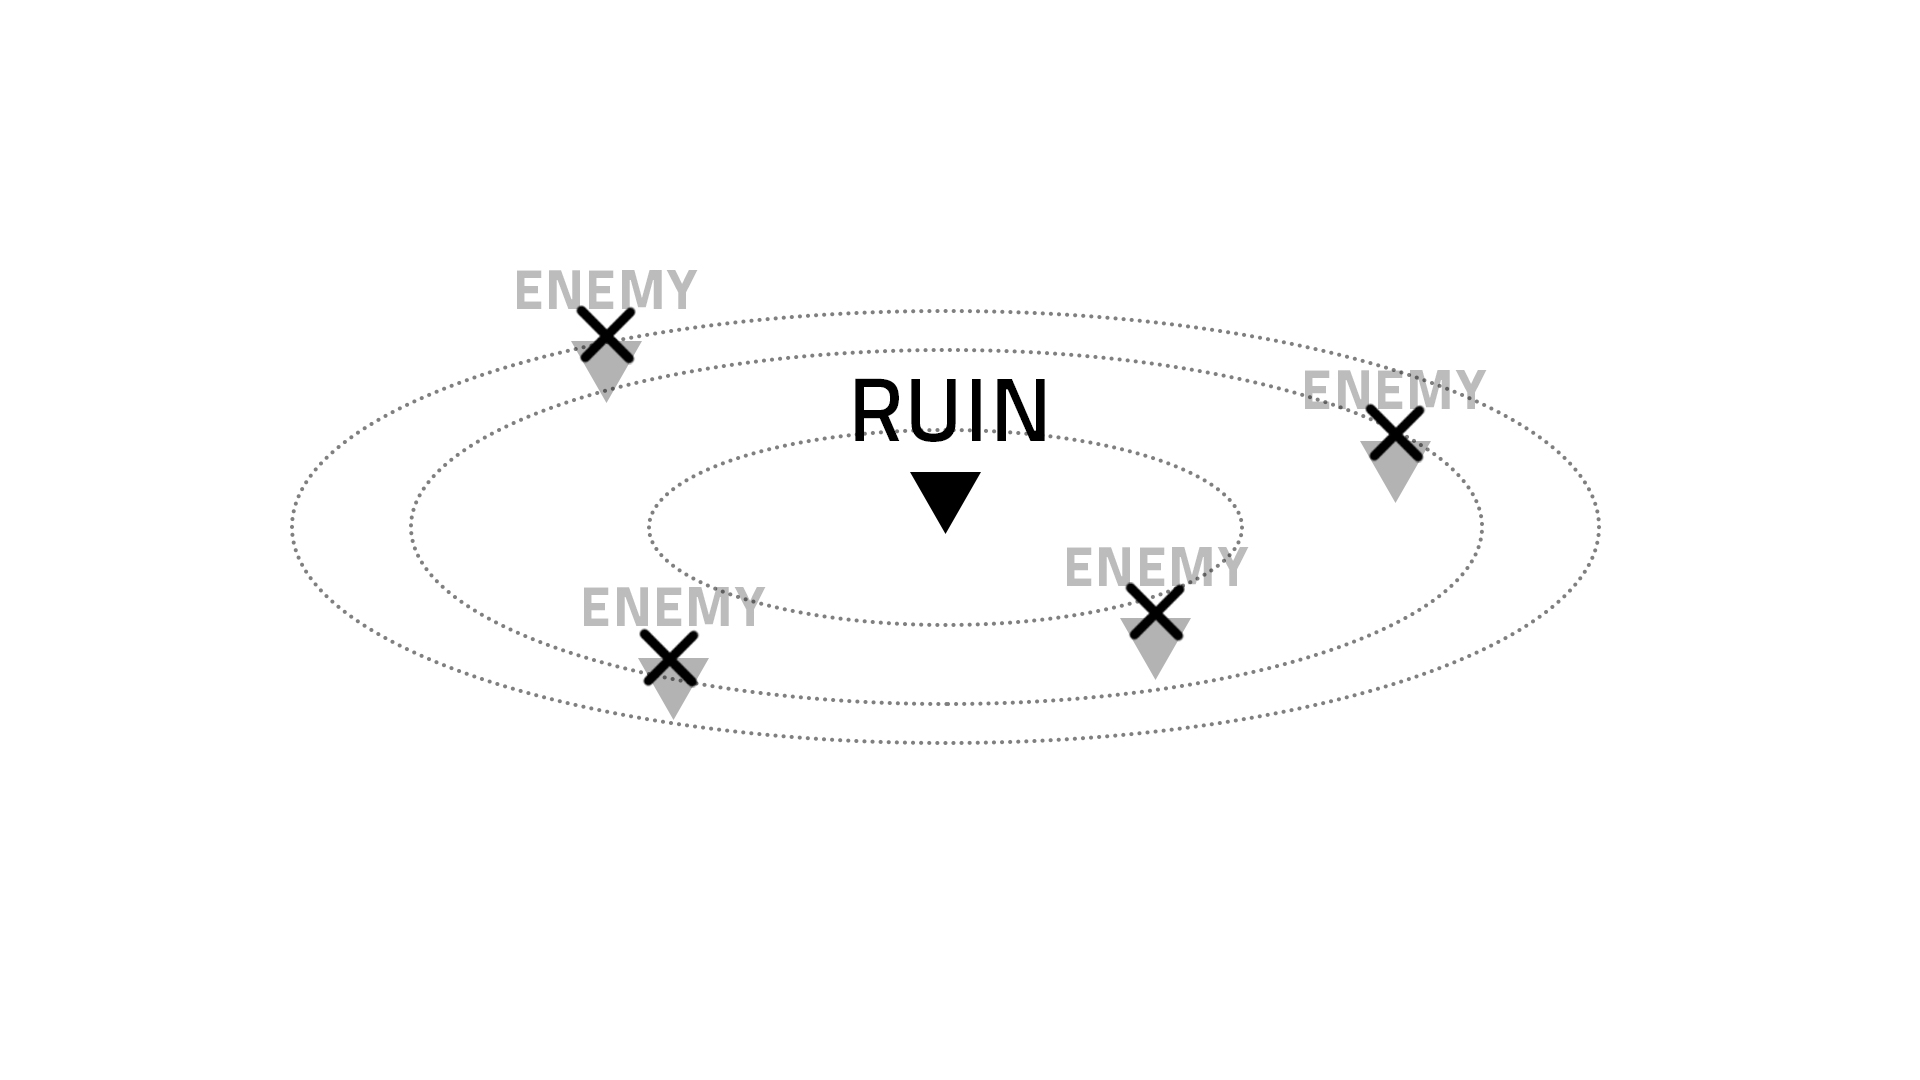 RUIN_Storyboard_Frame16.jpg